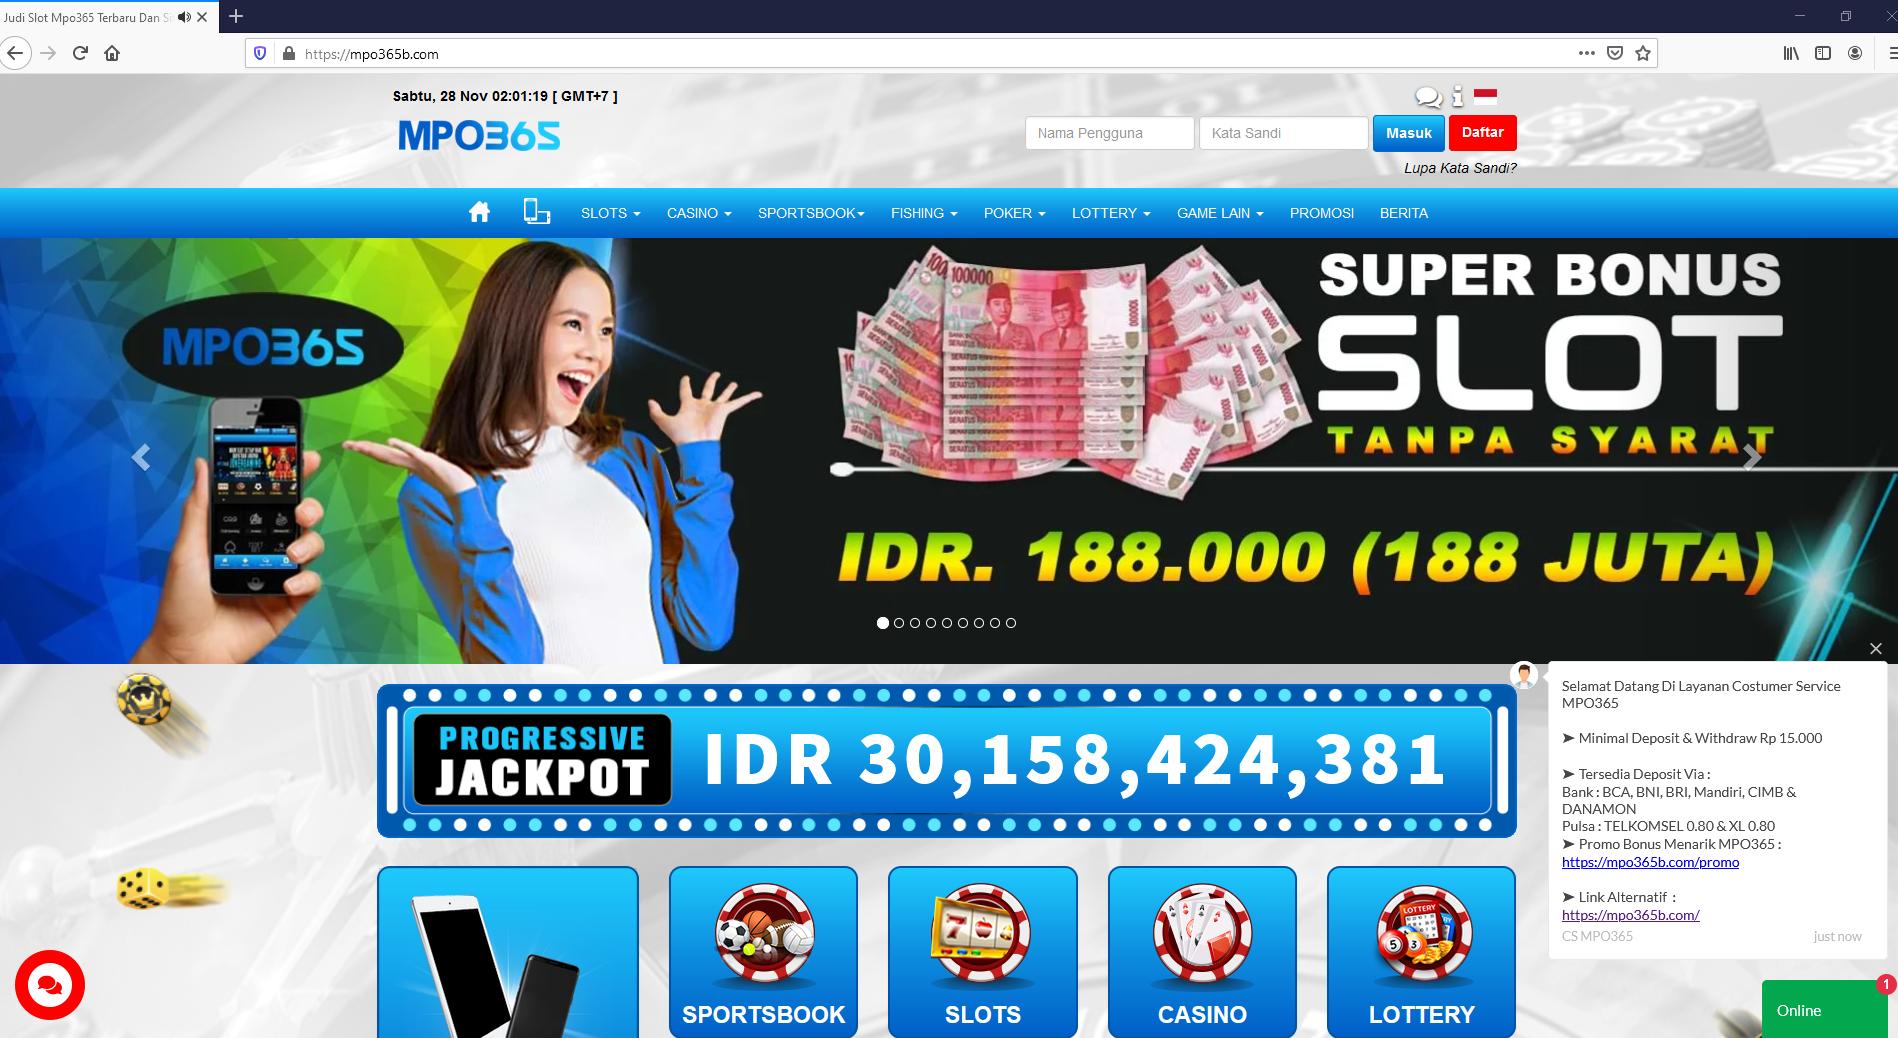 Aar 1137 Mpo365 Agen Judi Slot Online Deposit Pulsa Axis Tanpa Potongan Asf Jira